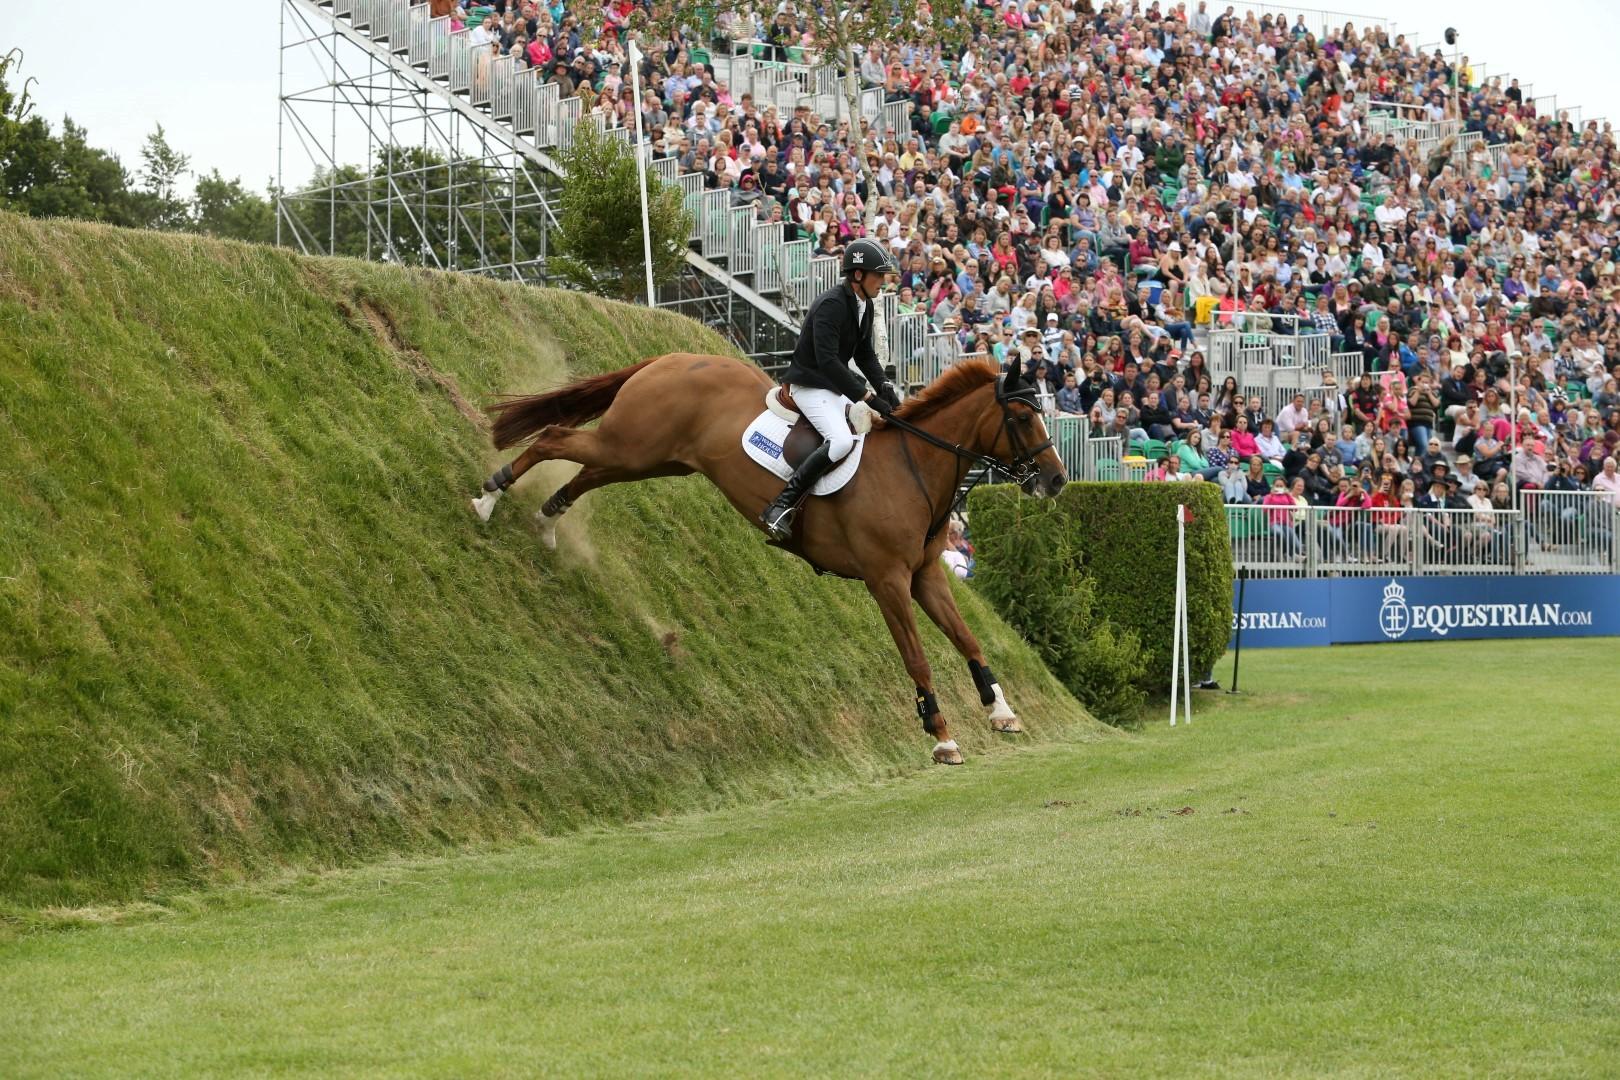 Trevor Breen and Loughnatousa WB, winners of the 2015 Equestrian.com Derby (c) Julian Portch